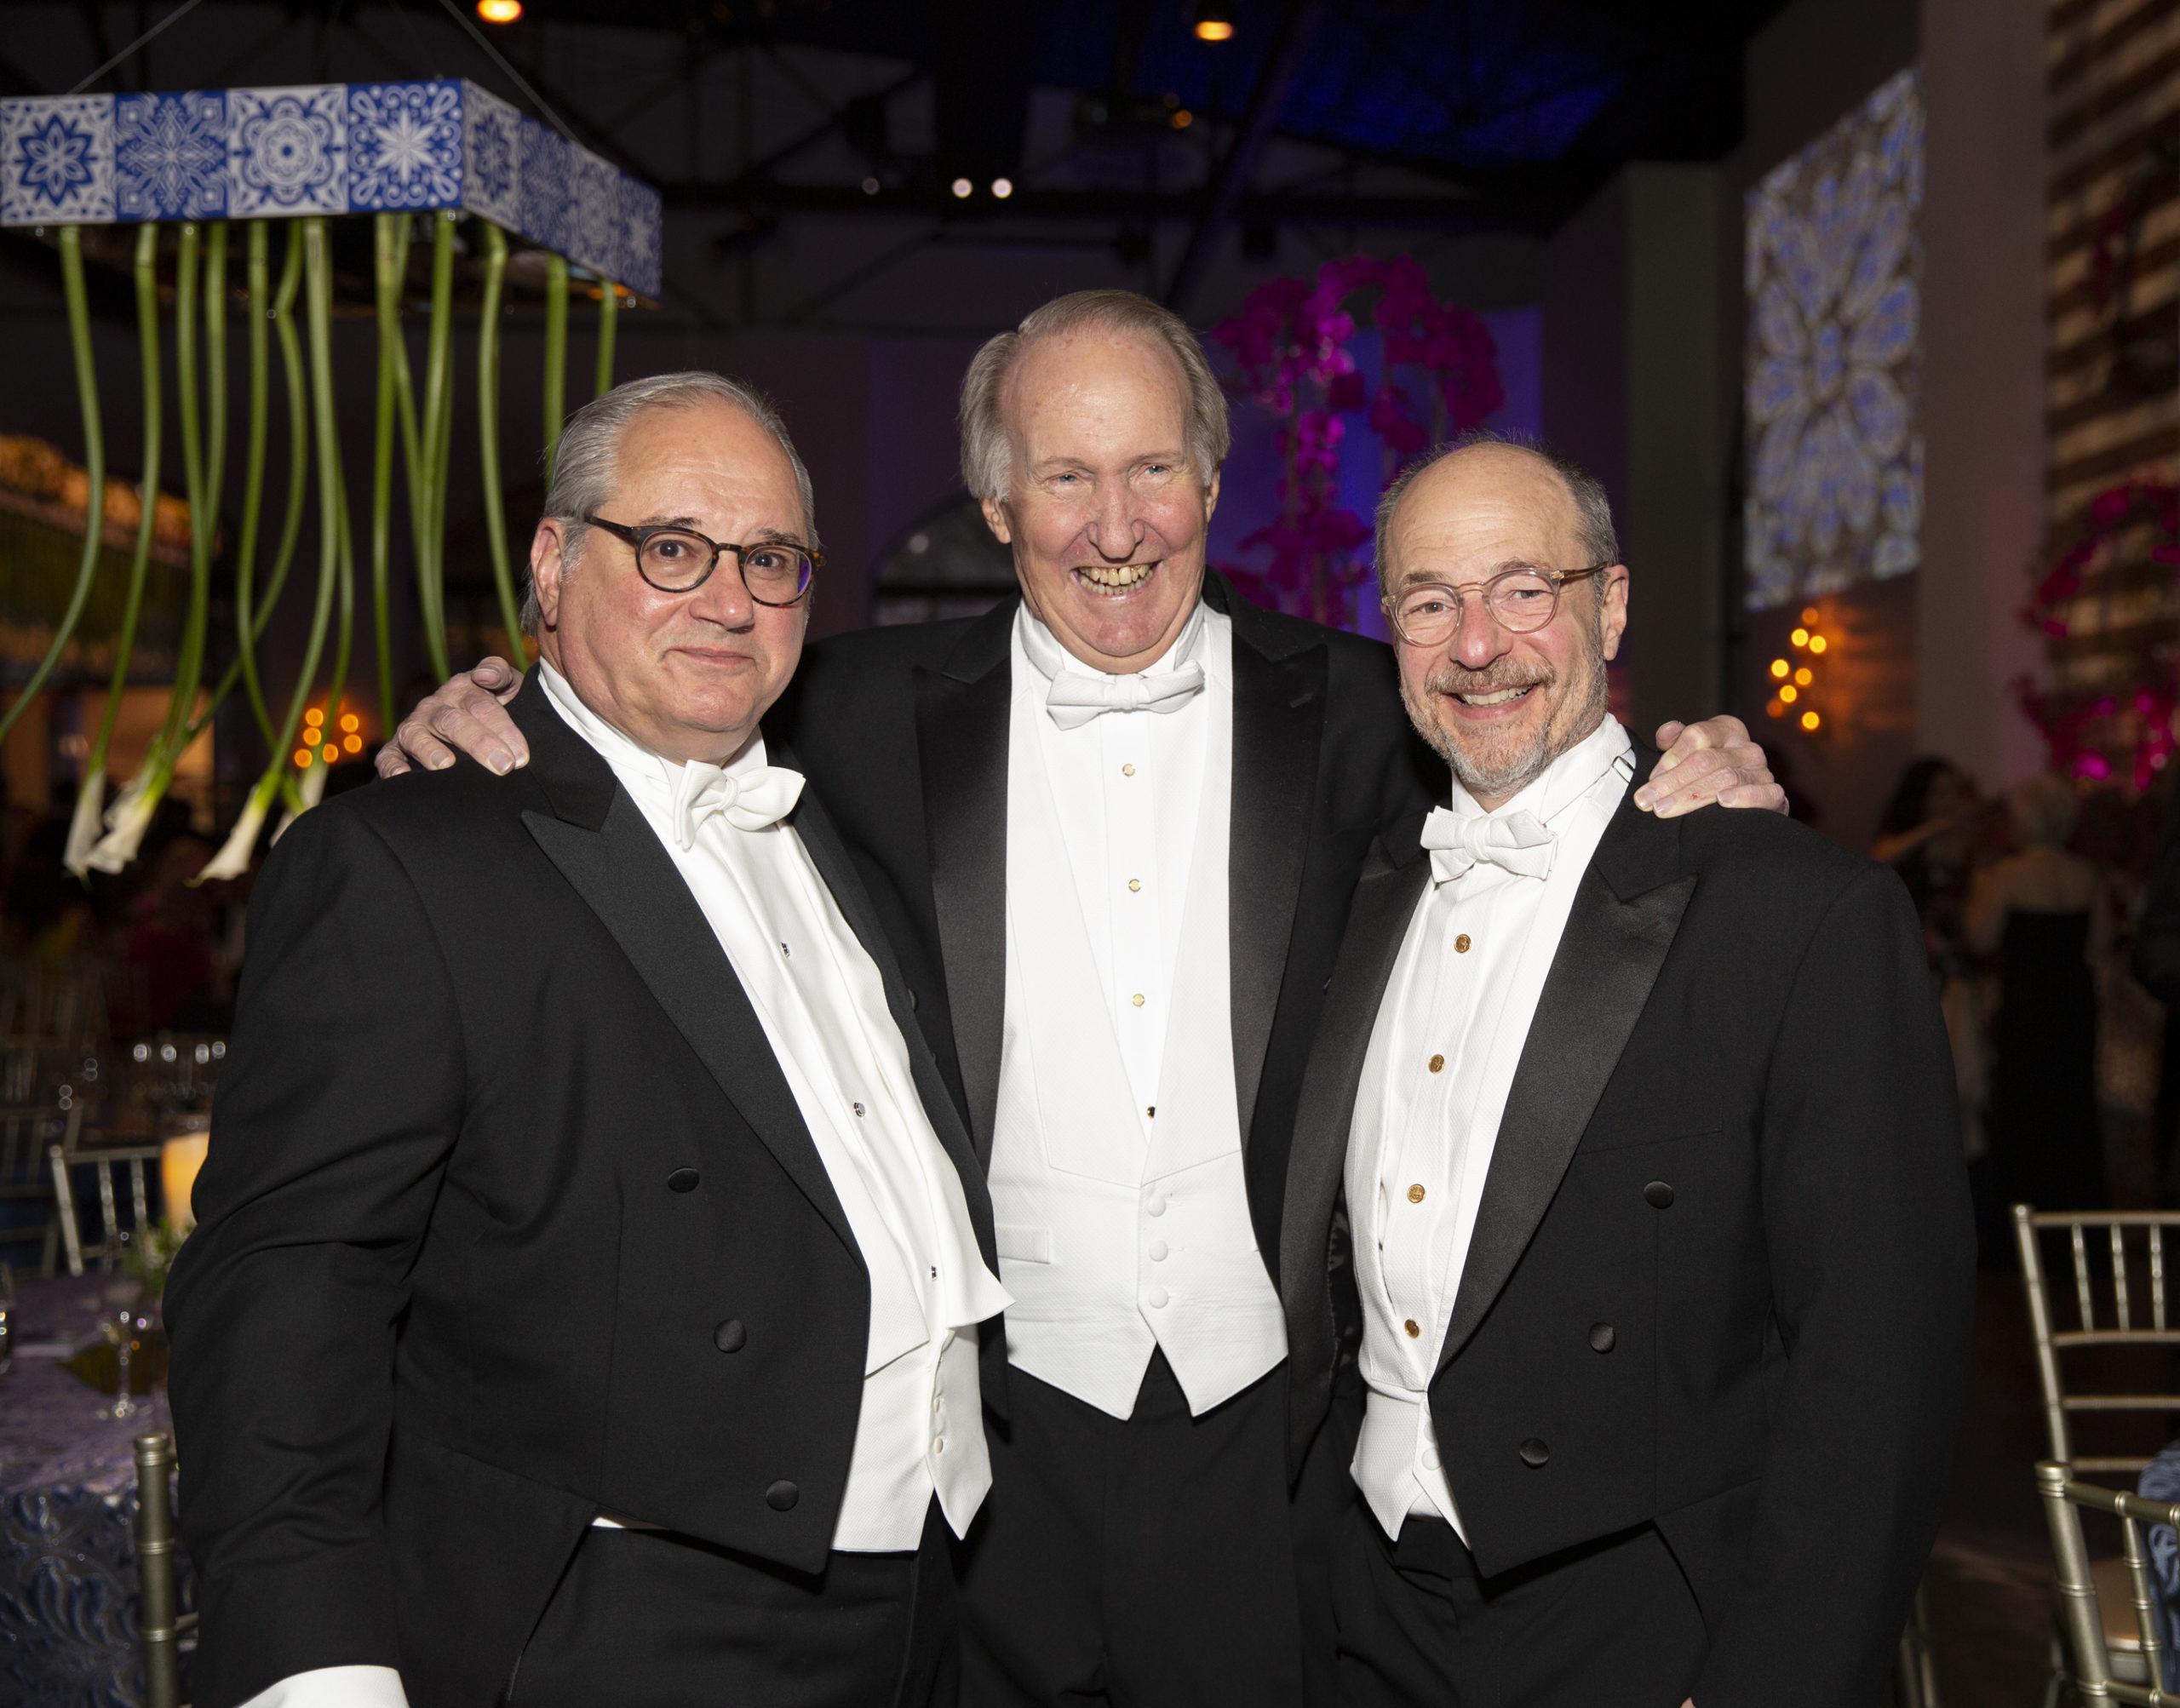 Tony Petrello, Jim Crownover and Sam